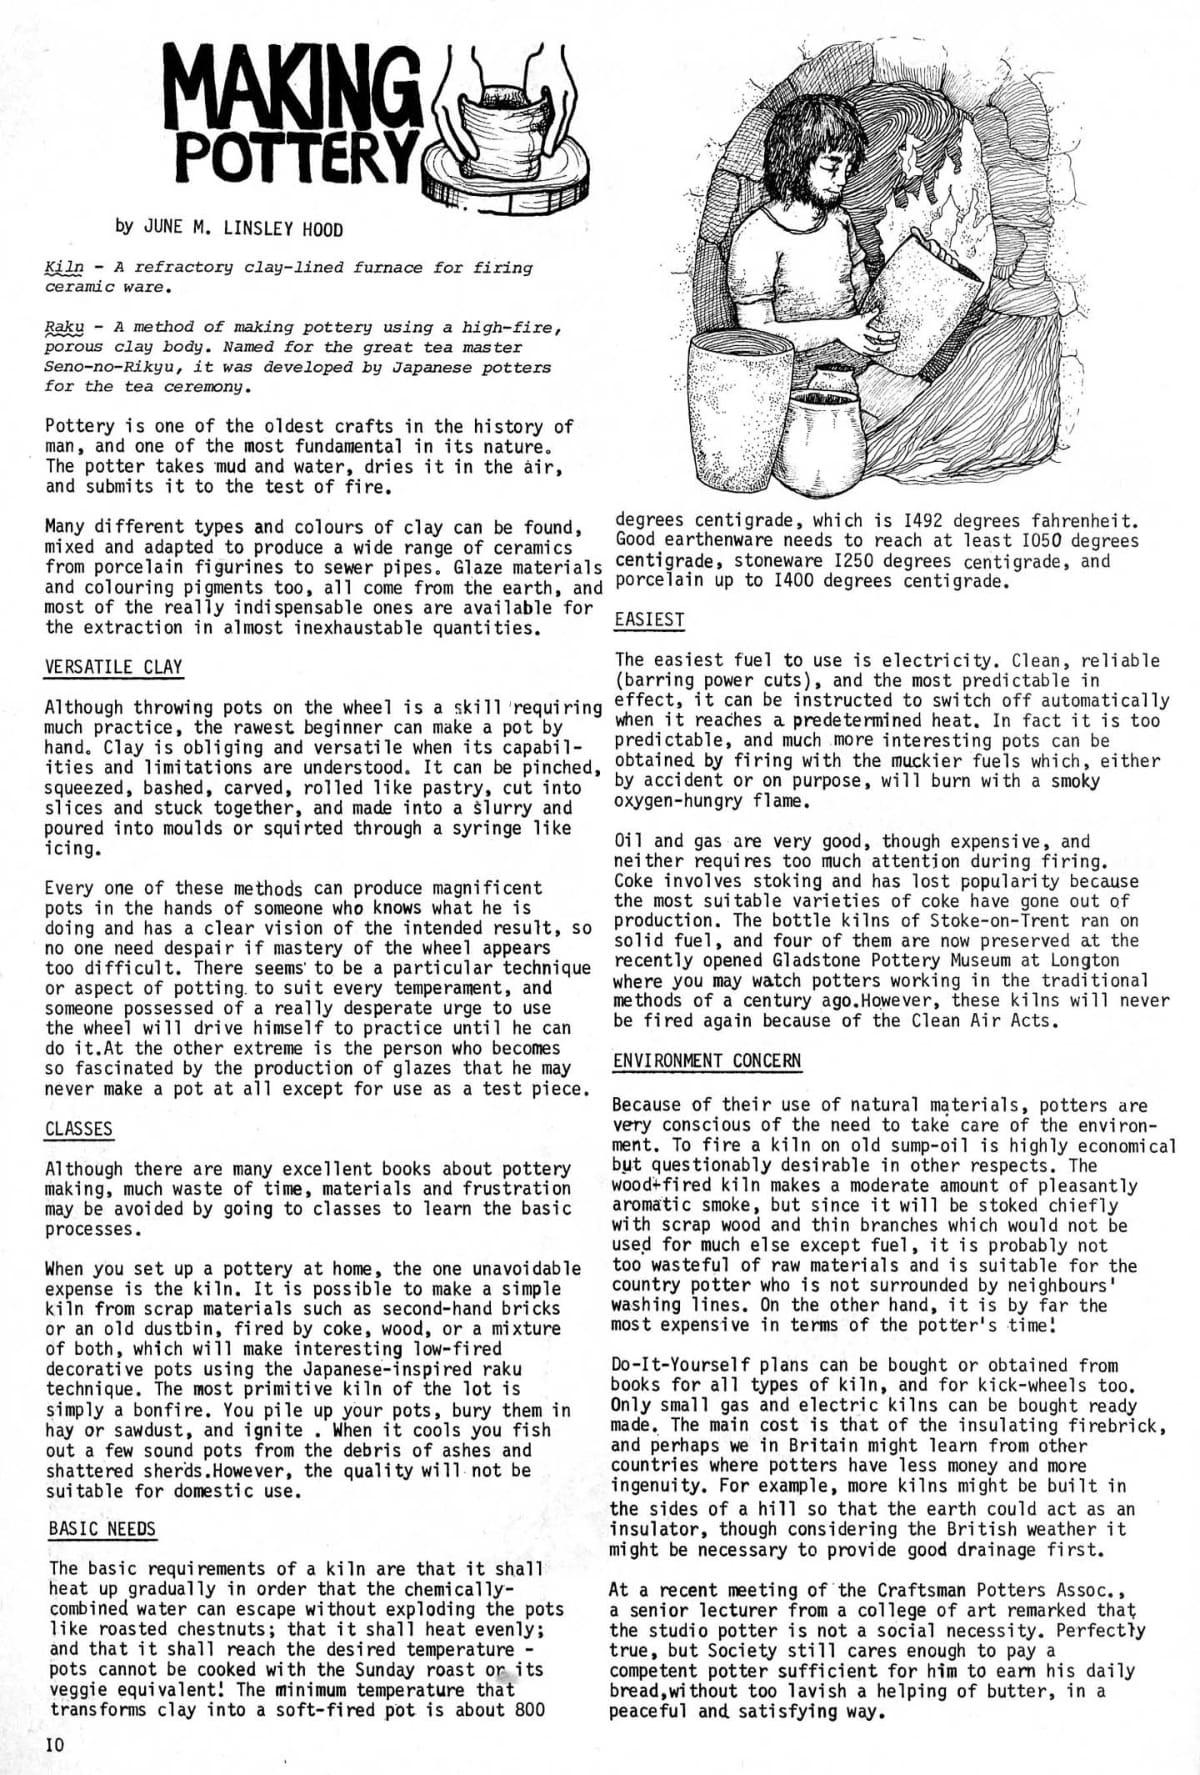 seed-v4-n1-jan1975-10.jpg